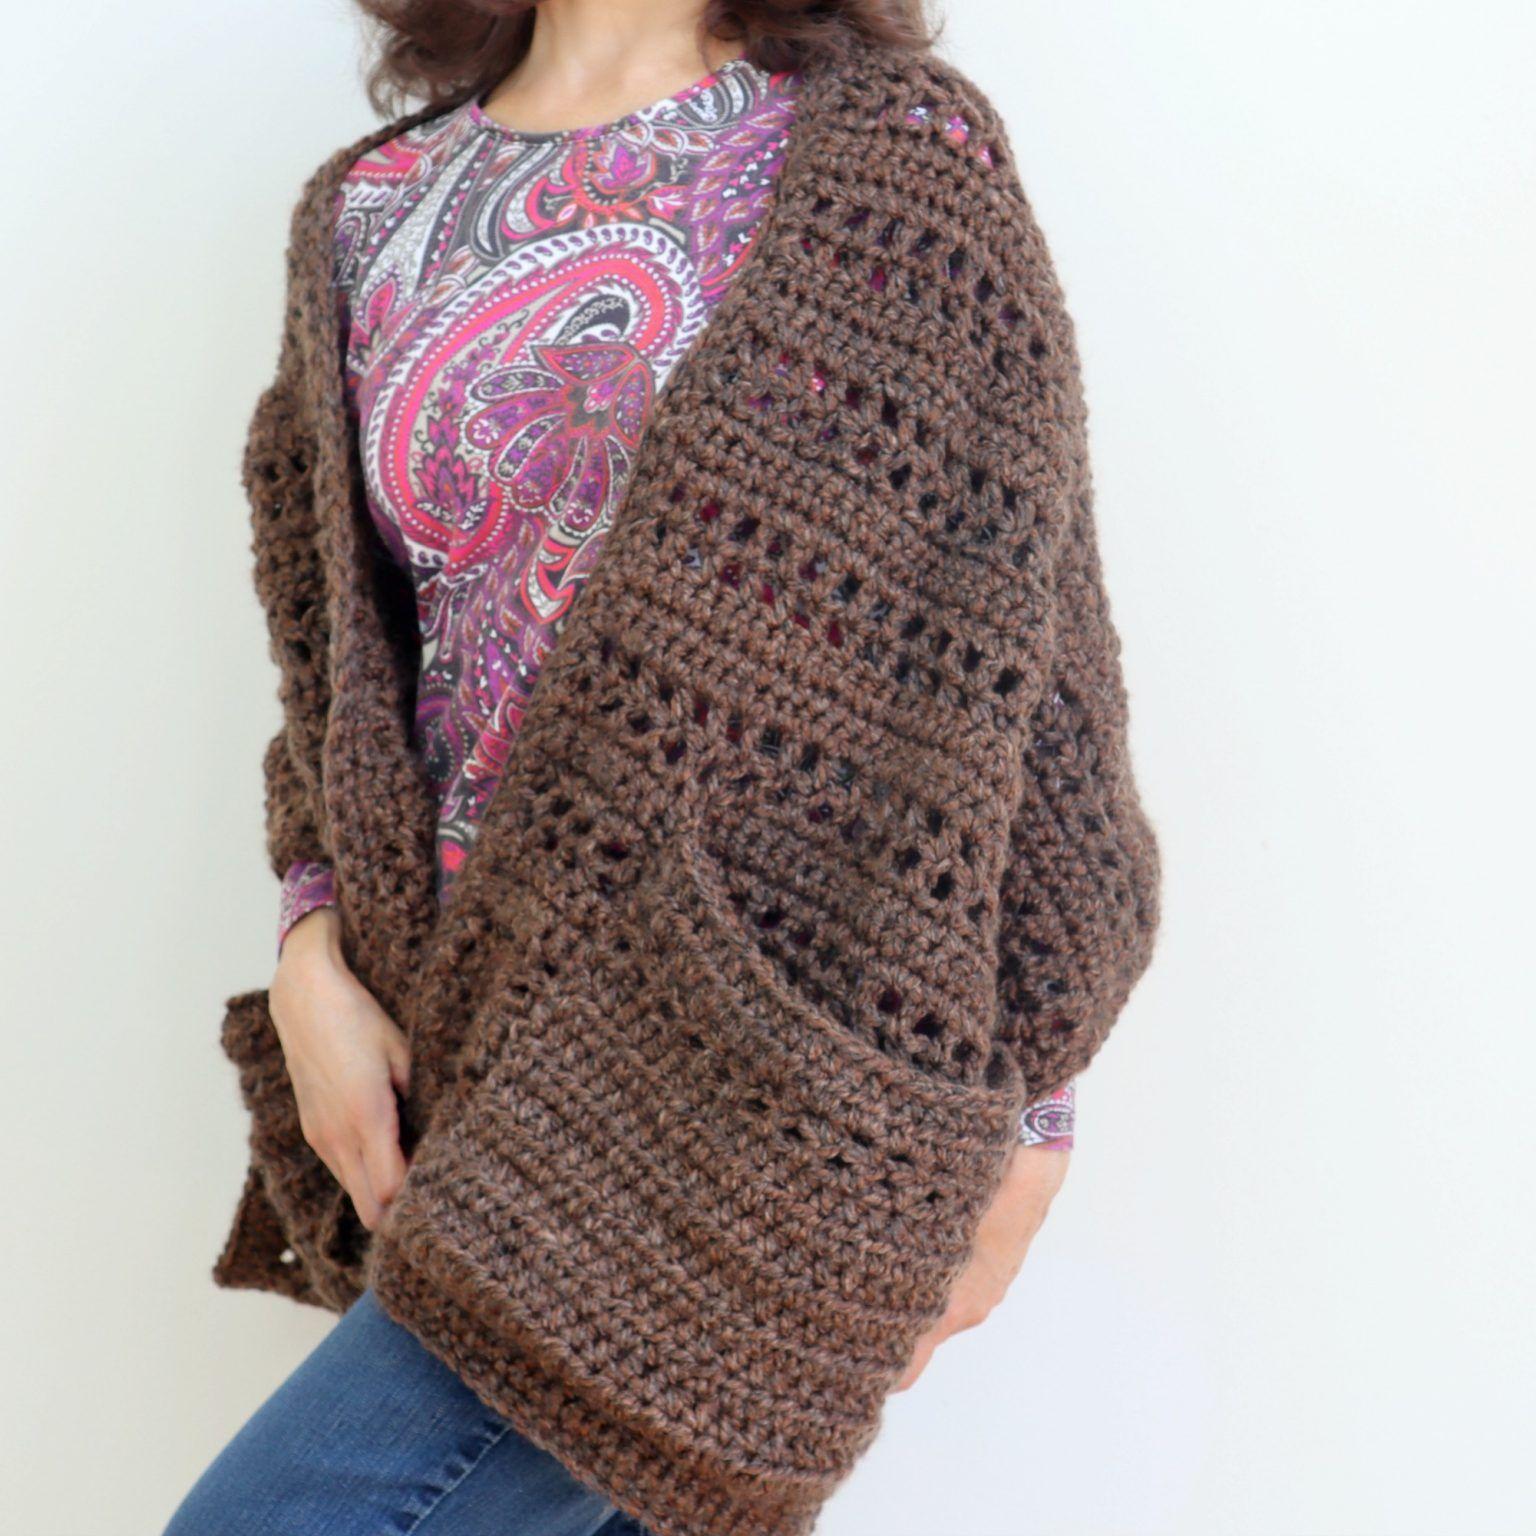 Easy Crochet Pocket Shawl - Crazy Cool Crochet | Crochet ...